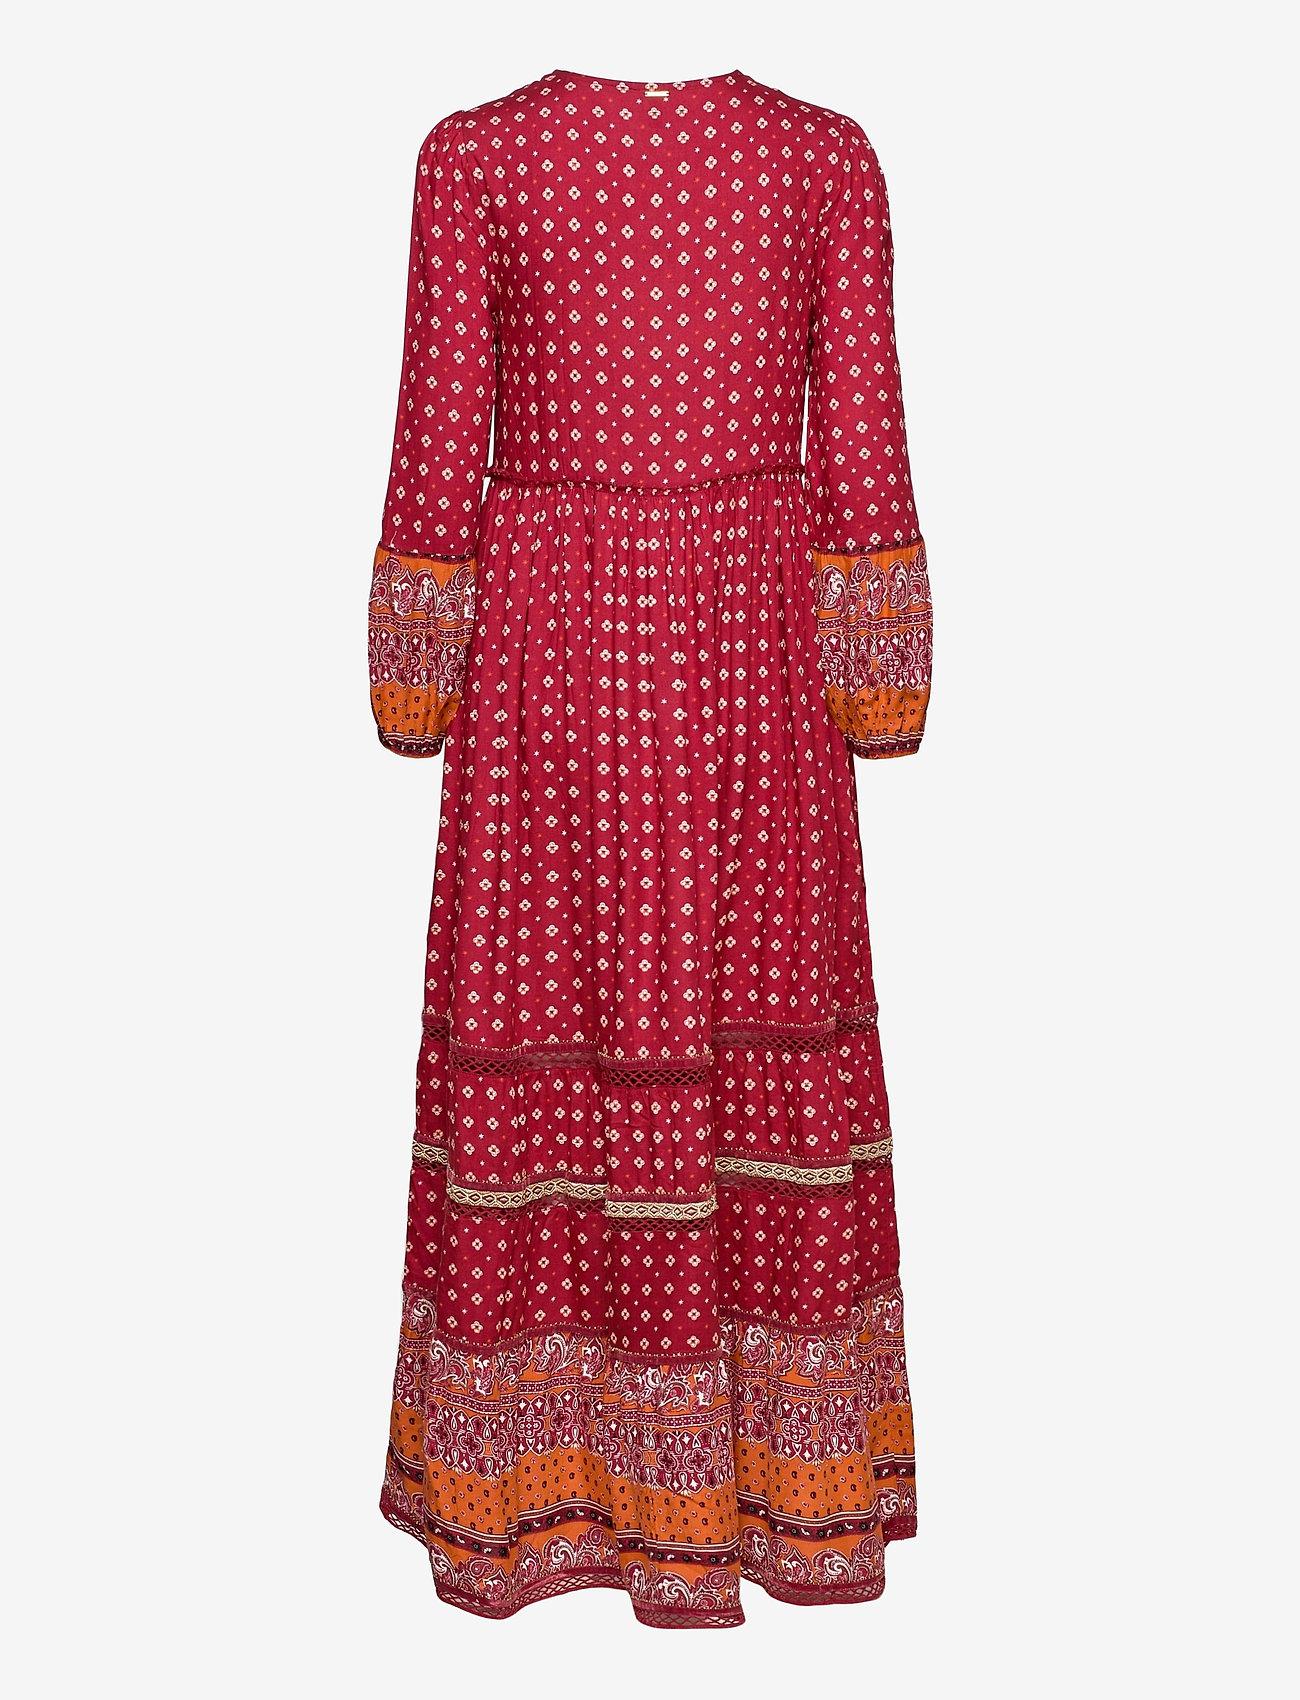 Superdry - AMEERA MAXI DRESS - everyday dresses - rust - 1